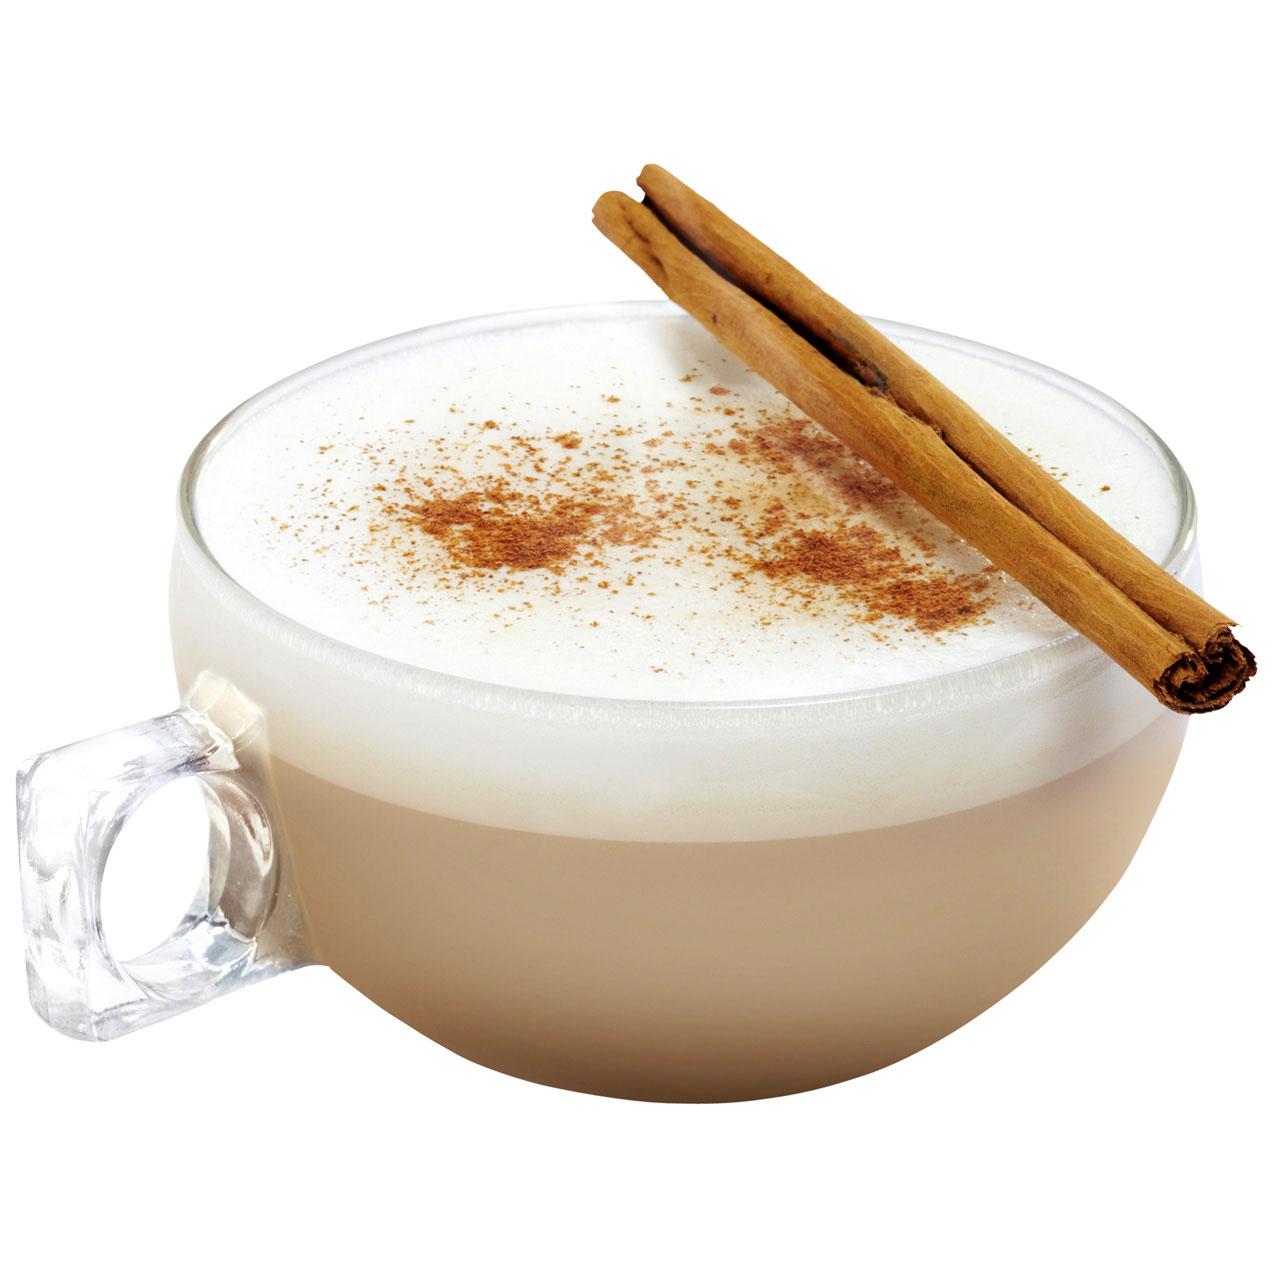 Nescafé Dolce Gusto Chai Tea Latte Glass, With Saucer